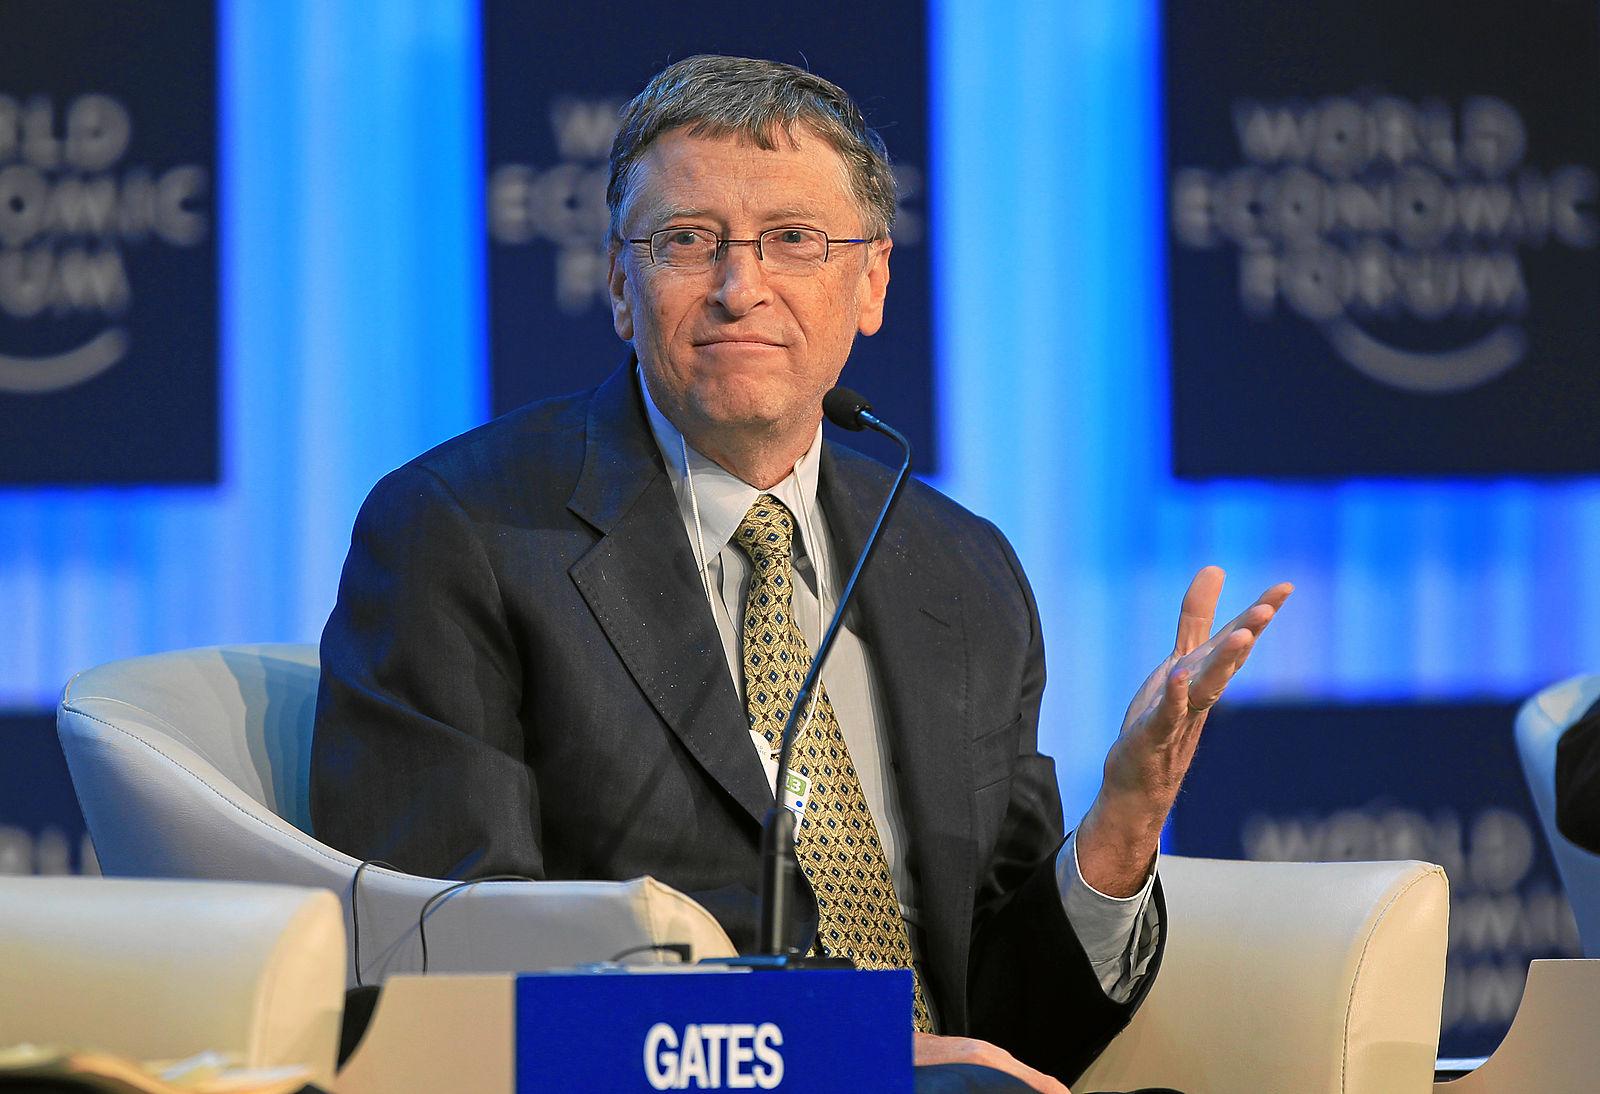 Bill_Gates_World_Economic_Forum_2013